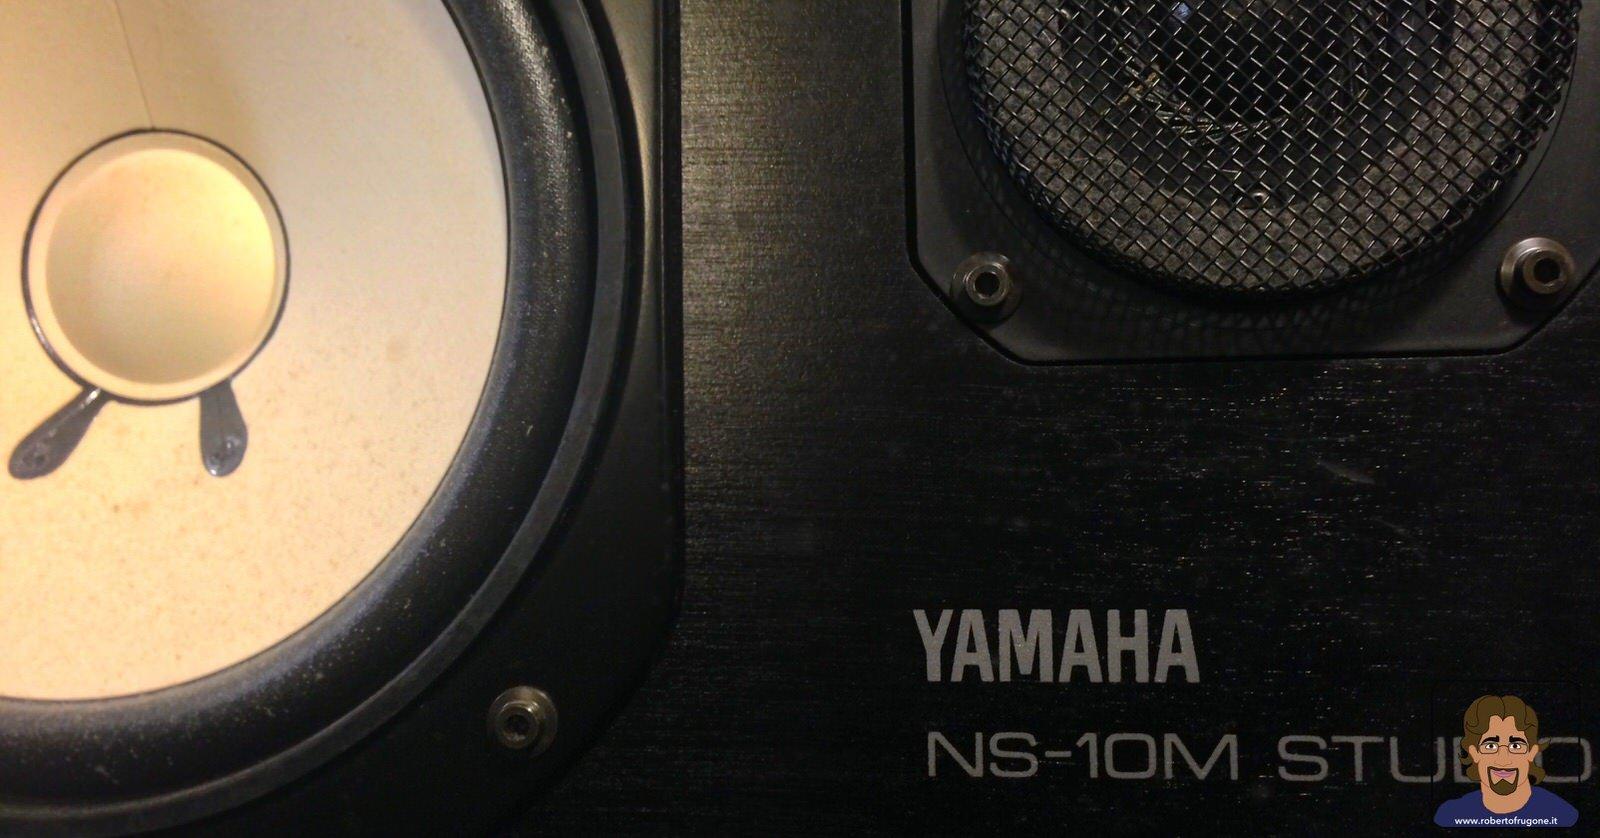 Totem Studio Sala Prove Musicali Casarza Ligure cassa Yamaha NS-10M studio